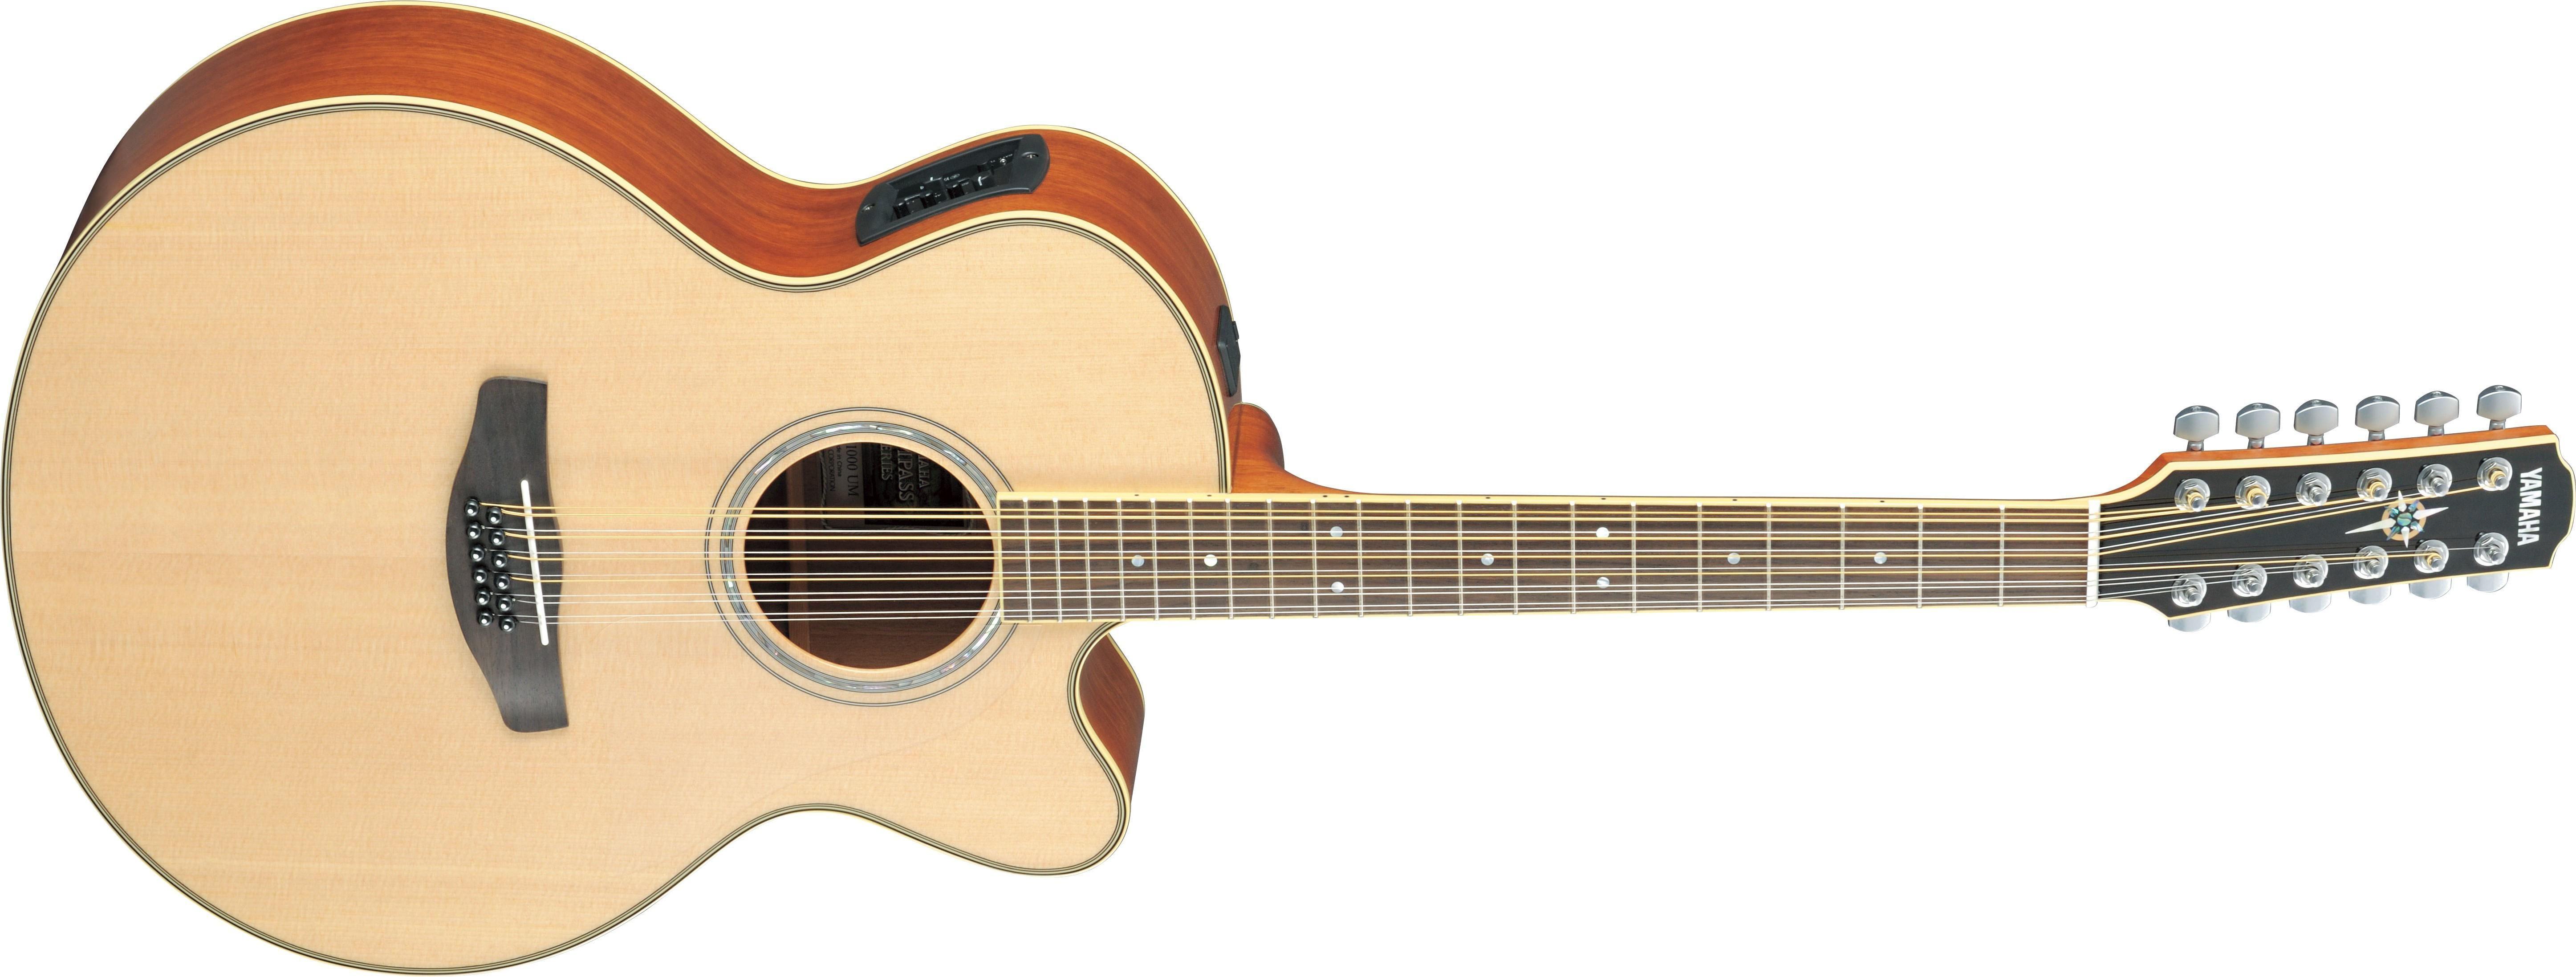 Pin on 12string guitars under 1500